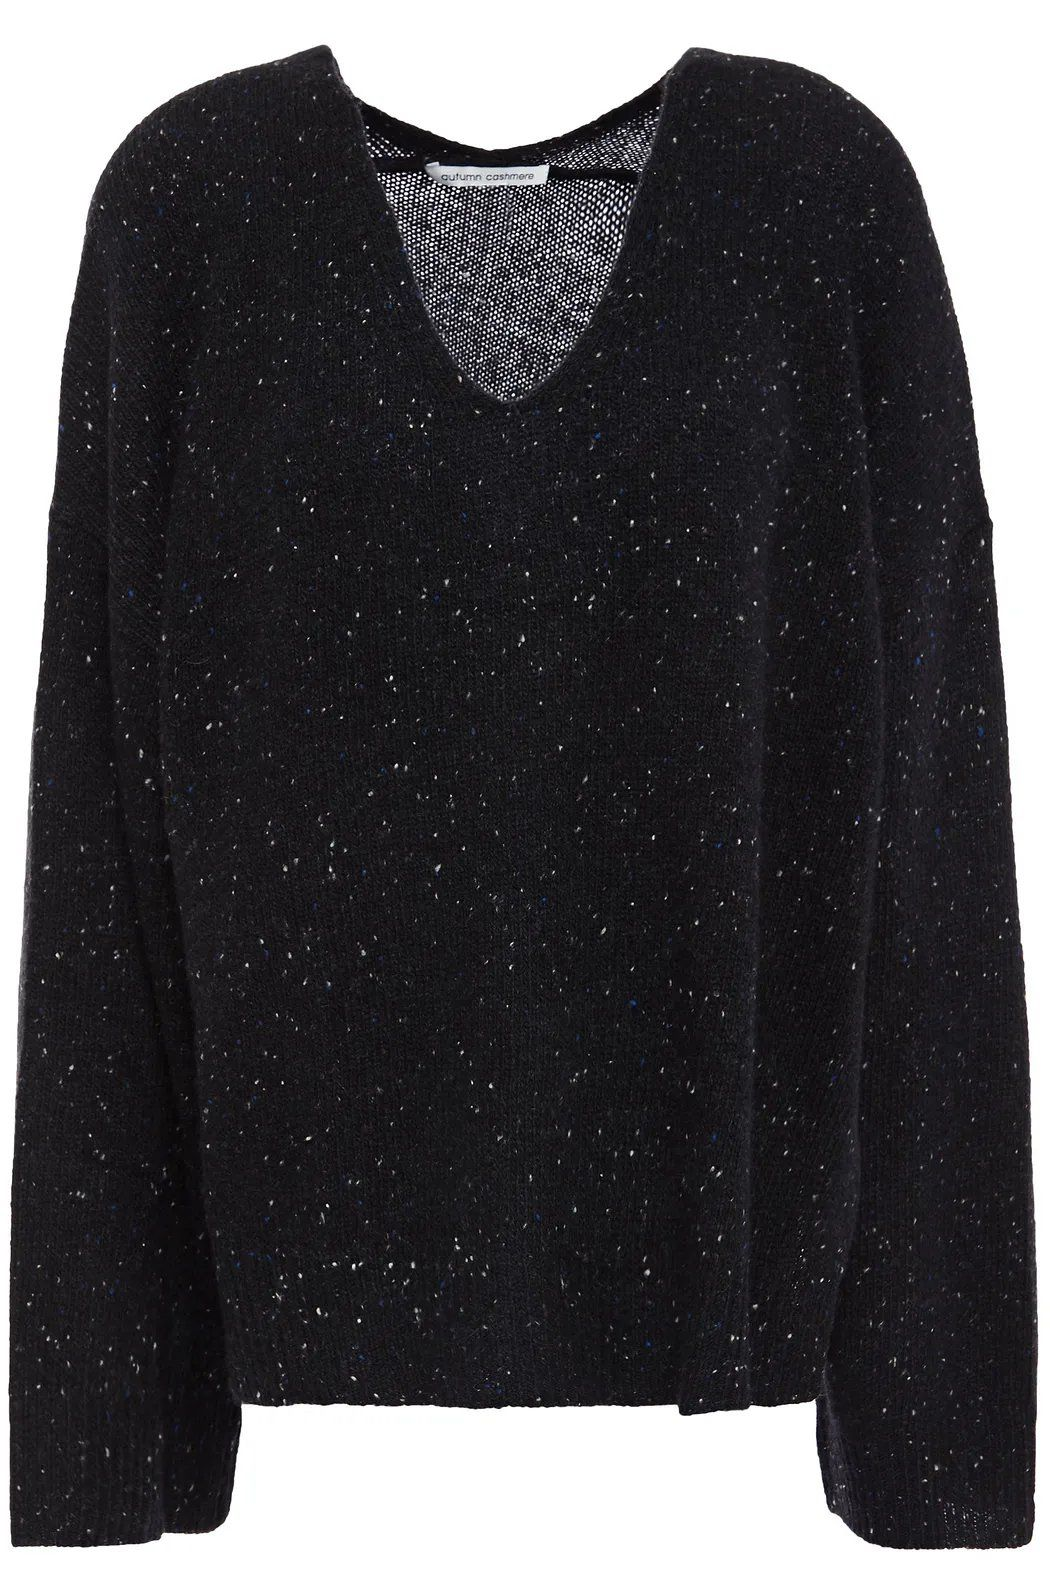 Autumn Cashmere Donegal Cashmere Sweater – Black / XS